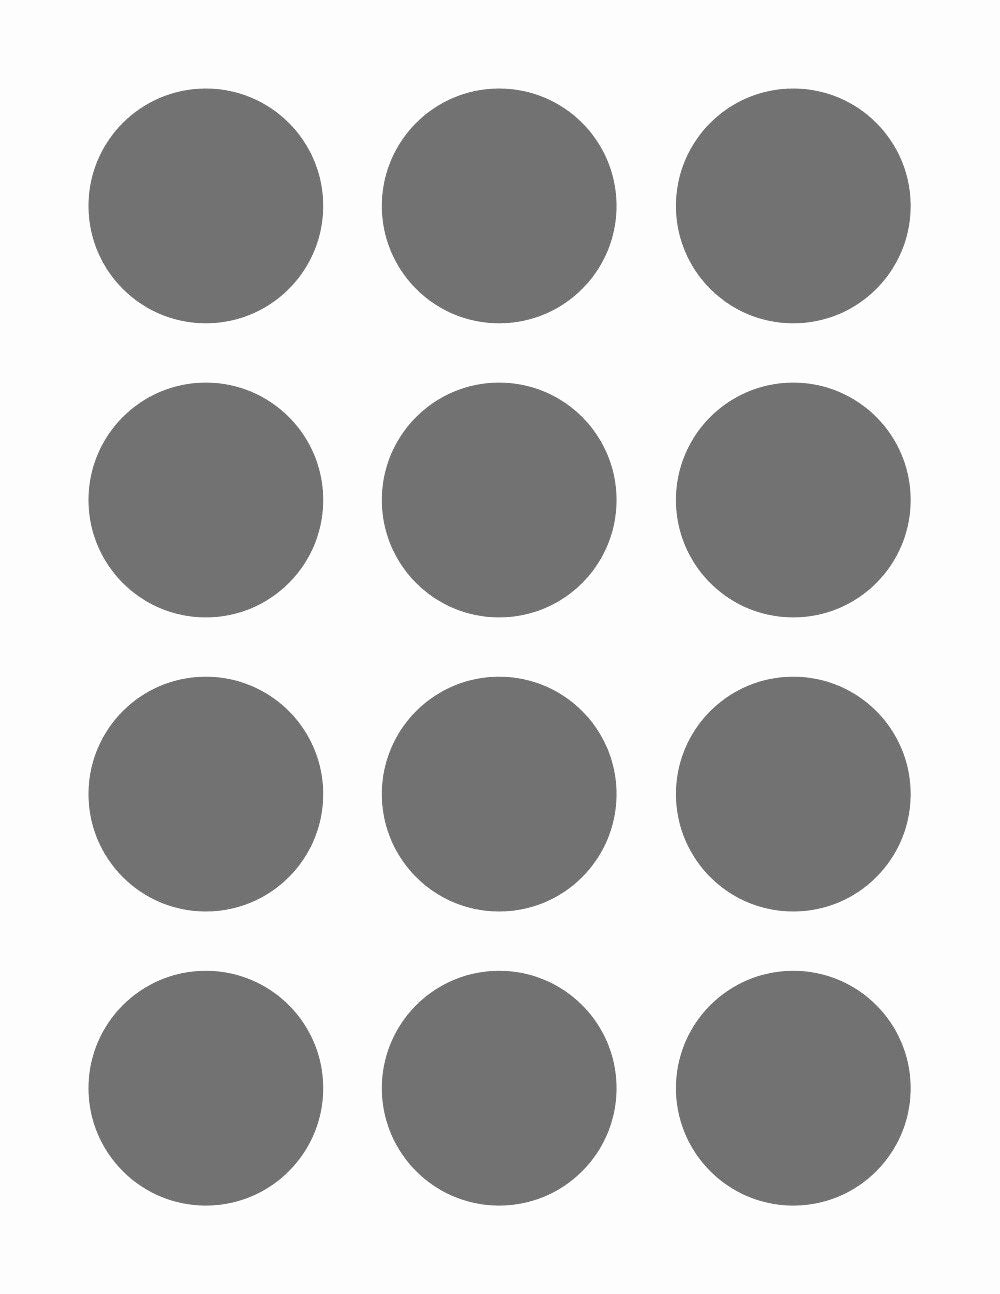 3 Inch Diameter Circle Template Fresh Psd Template 12 Circles 2 Inch Diameter From